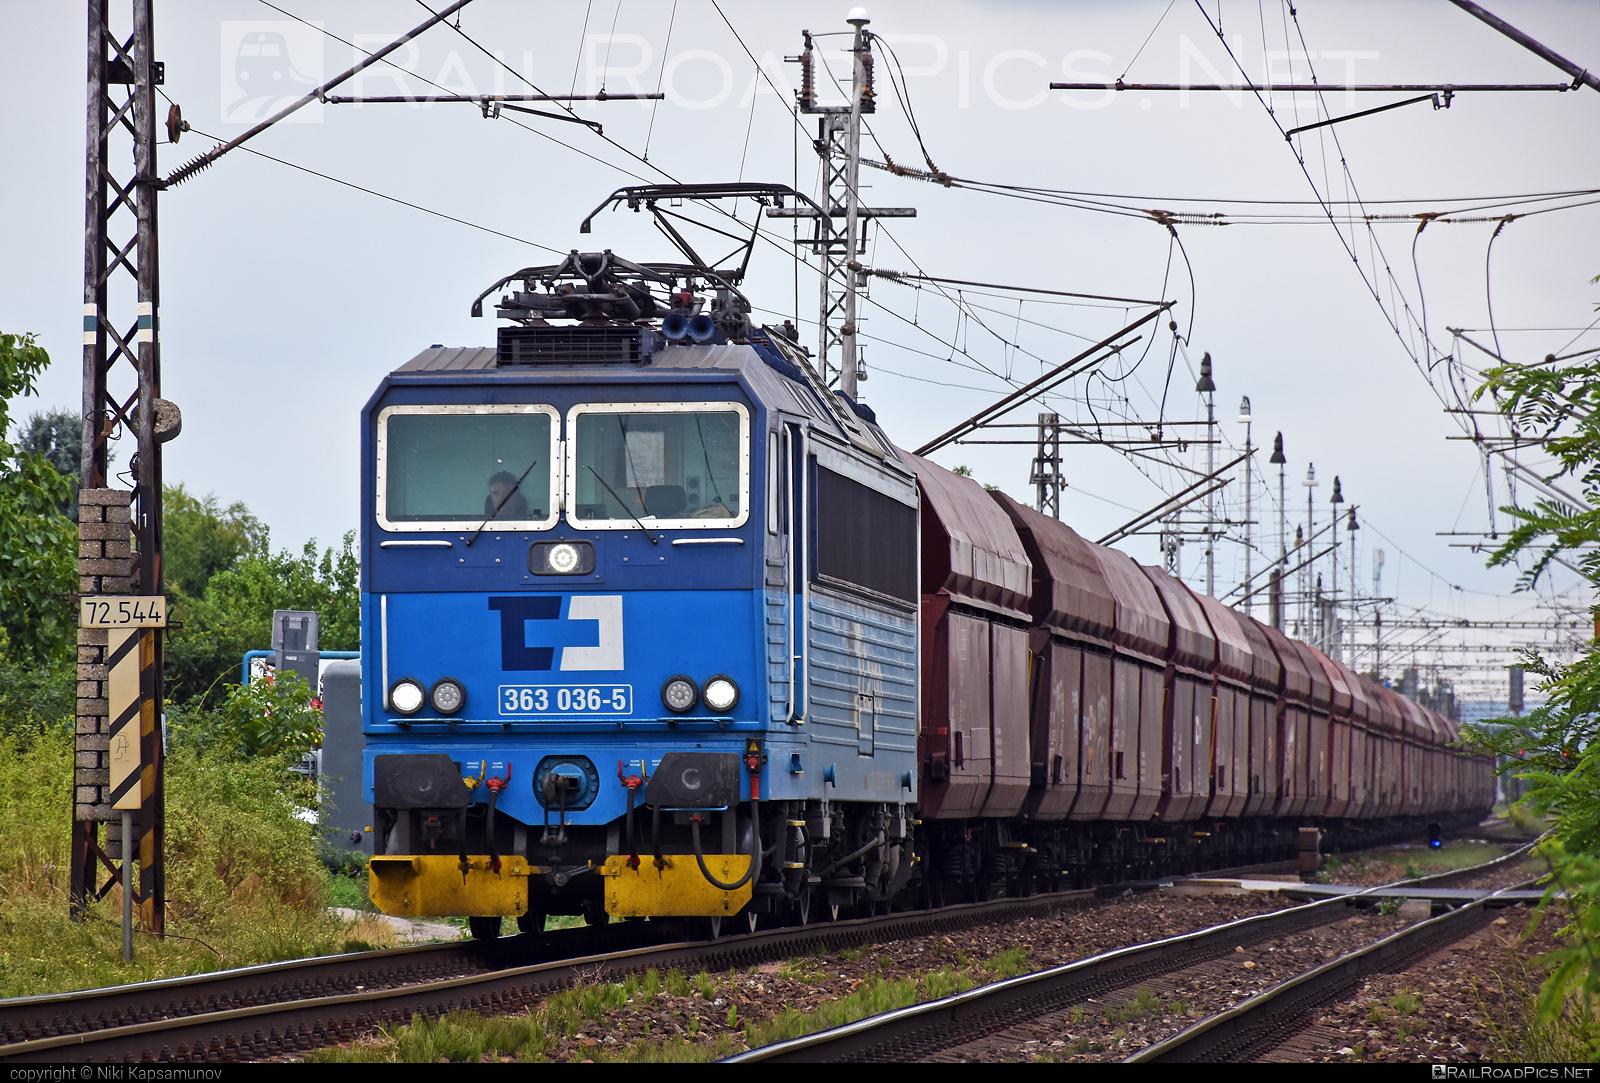 Škoda 69E - 363 036-5 operated by ČD Cargo, a.s. #cdcargo #es4991 #eso #hopperwagon #locomotive363 #skoda #skoda69e